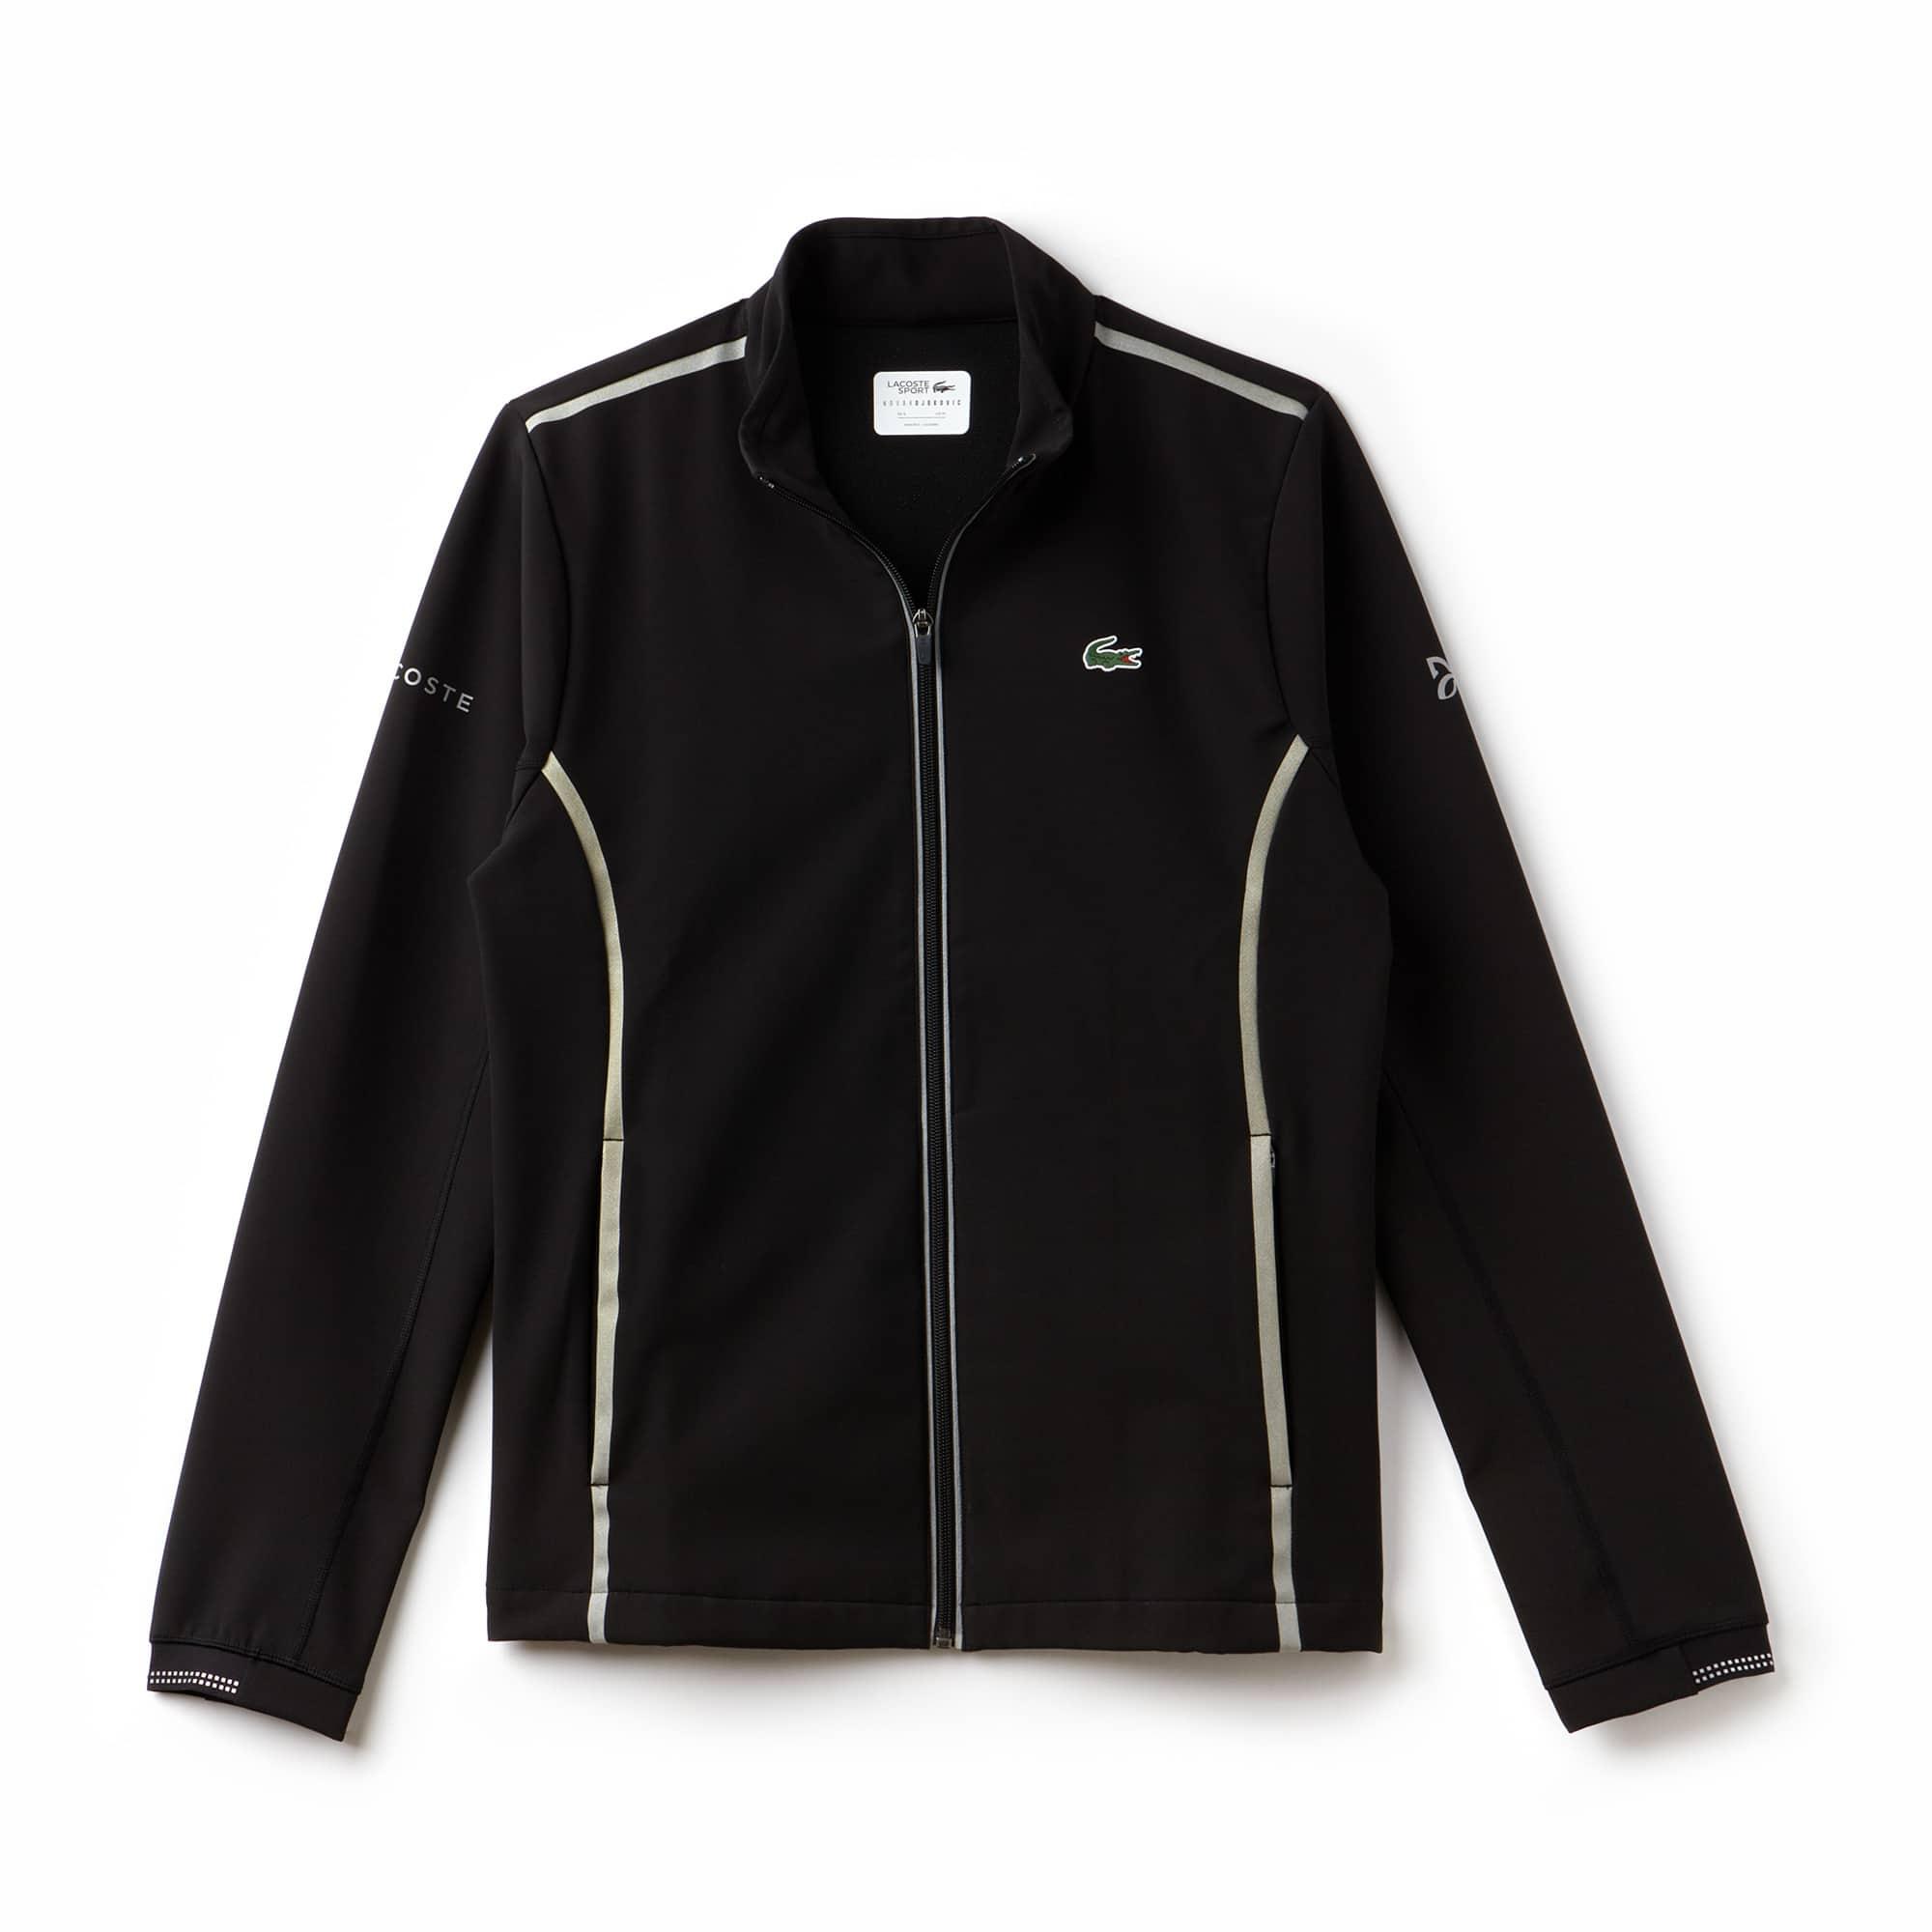 Men's Lacoste SPORT NOVAK DJOKOVIC SUPPORT WITH STYLE COLLECTION Technical Midlayer Zip Sweatshirt